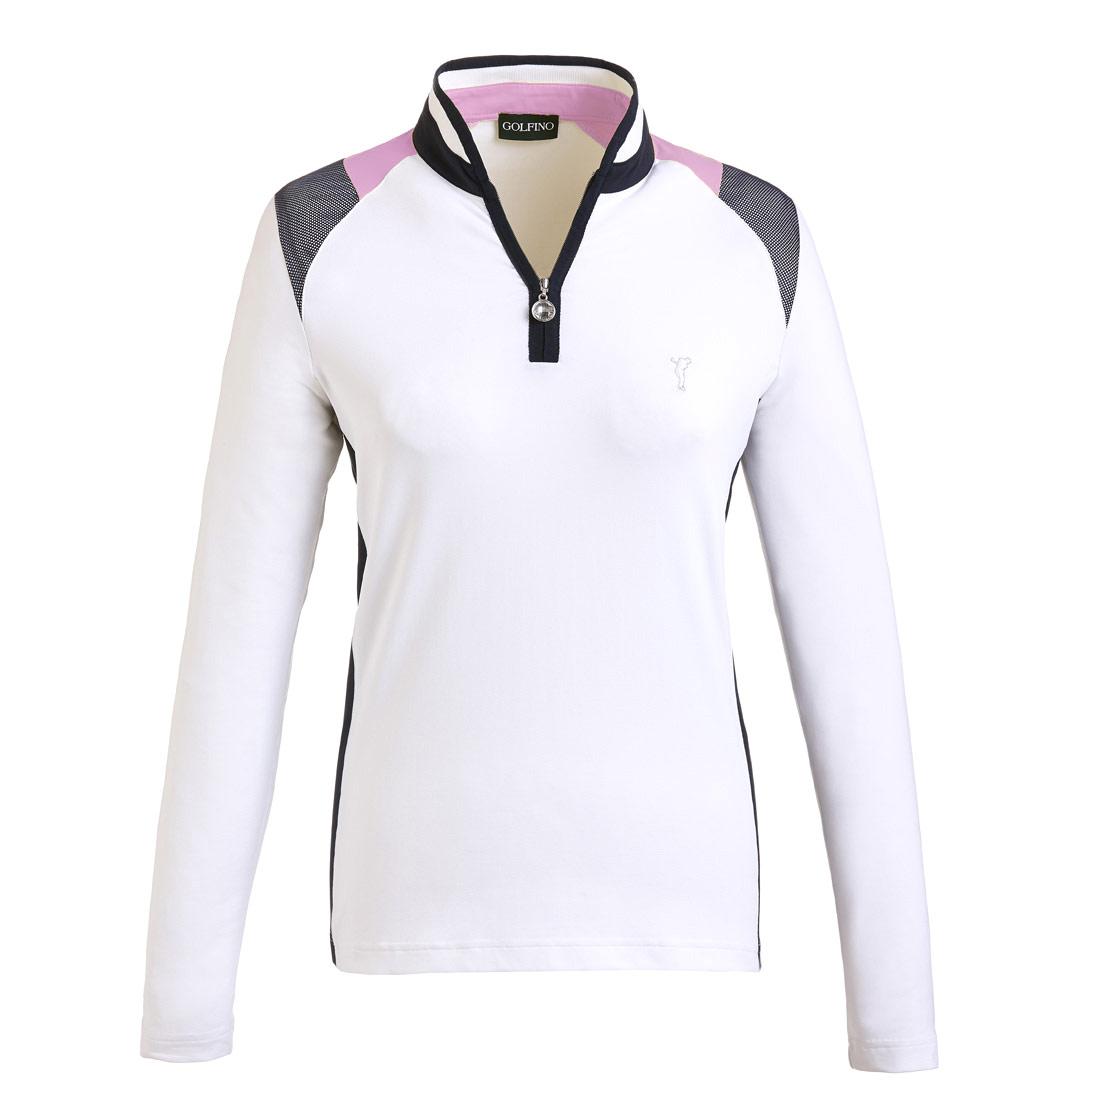 Damen Funktions-Golftroyer Longsleeve in Slim Fit